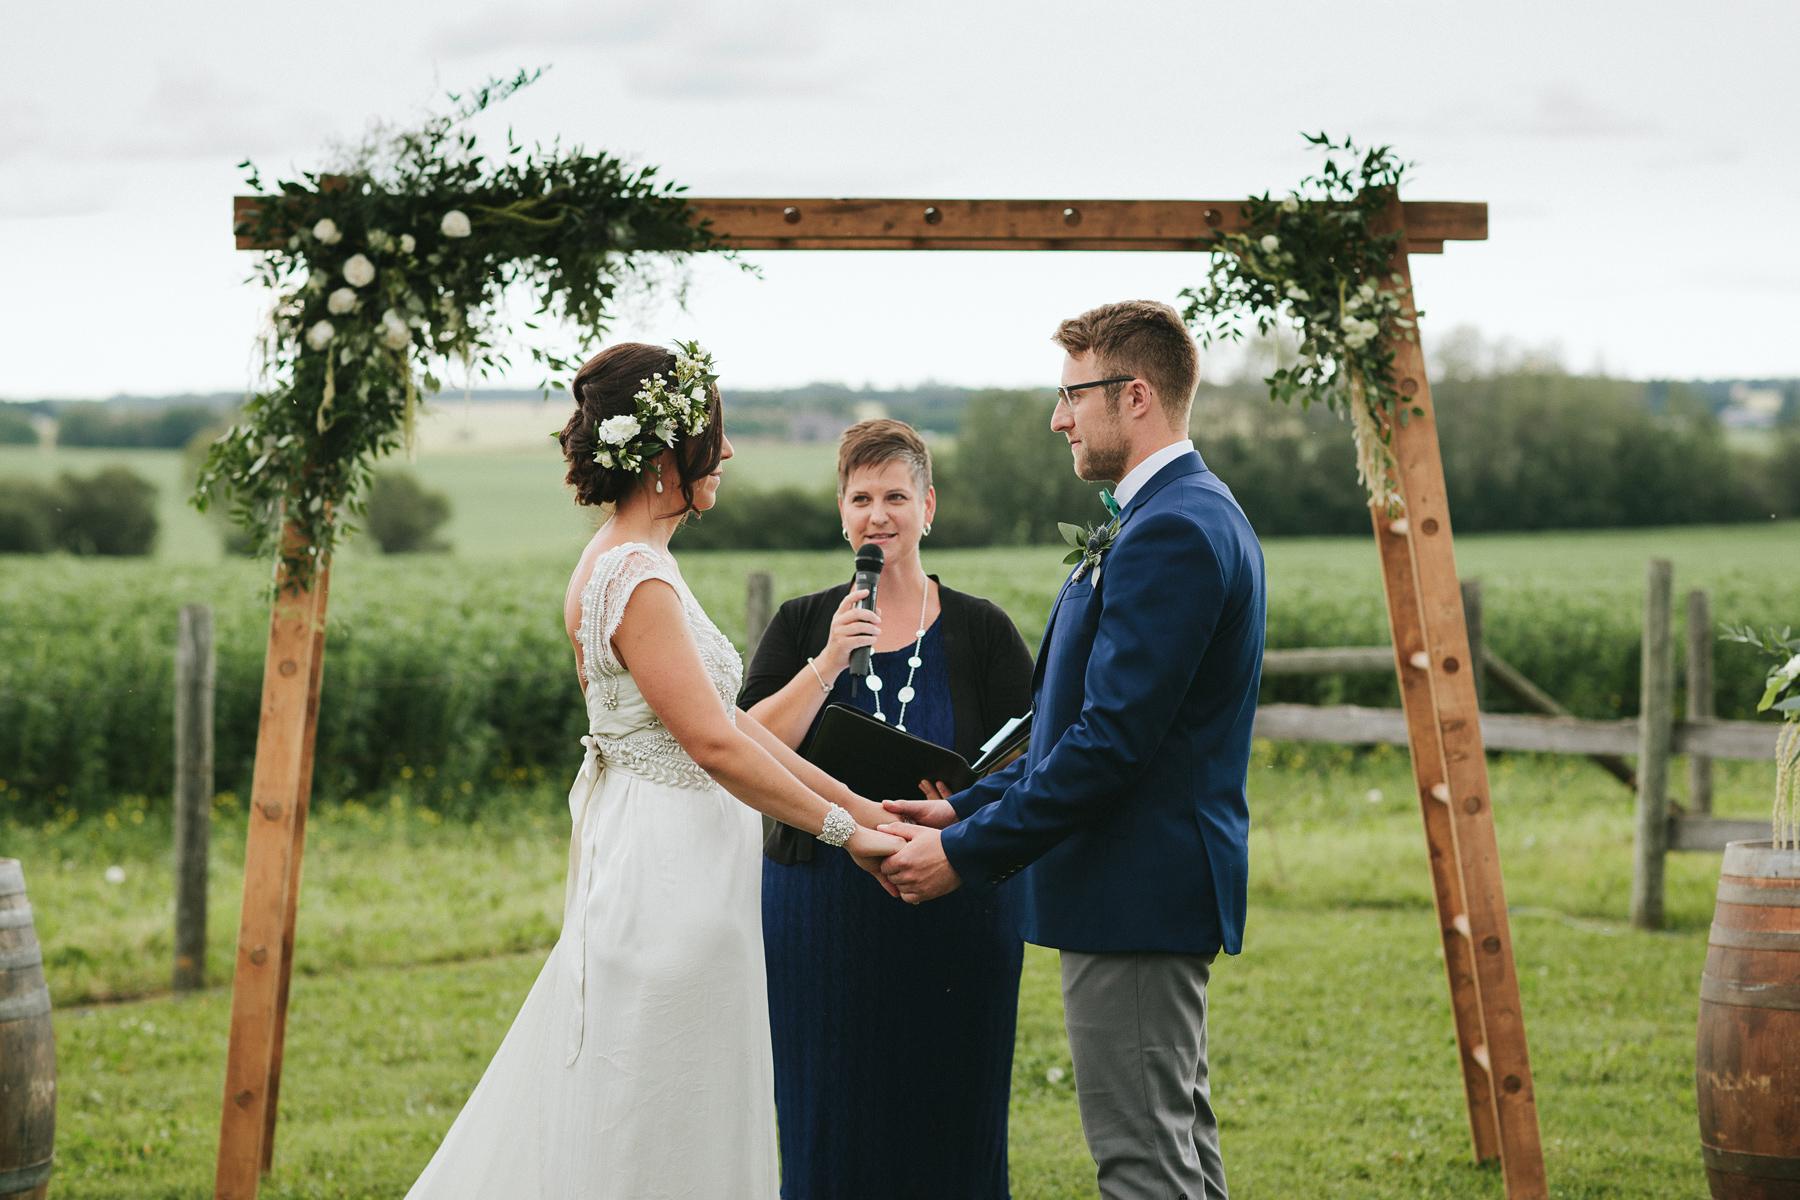 alberta-farm-wedding-photographer-rp-wj-111.jpg